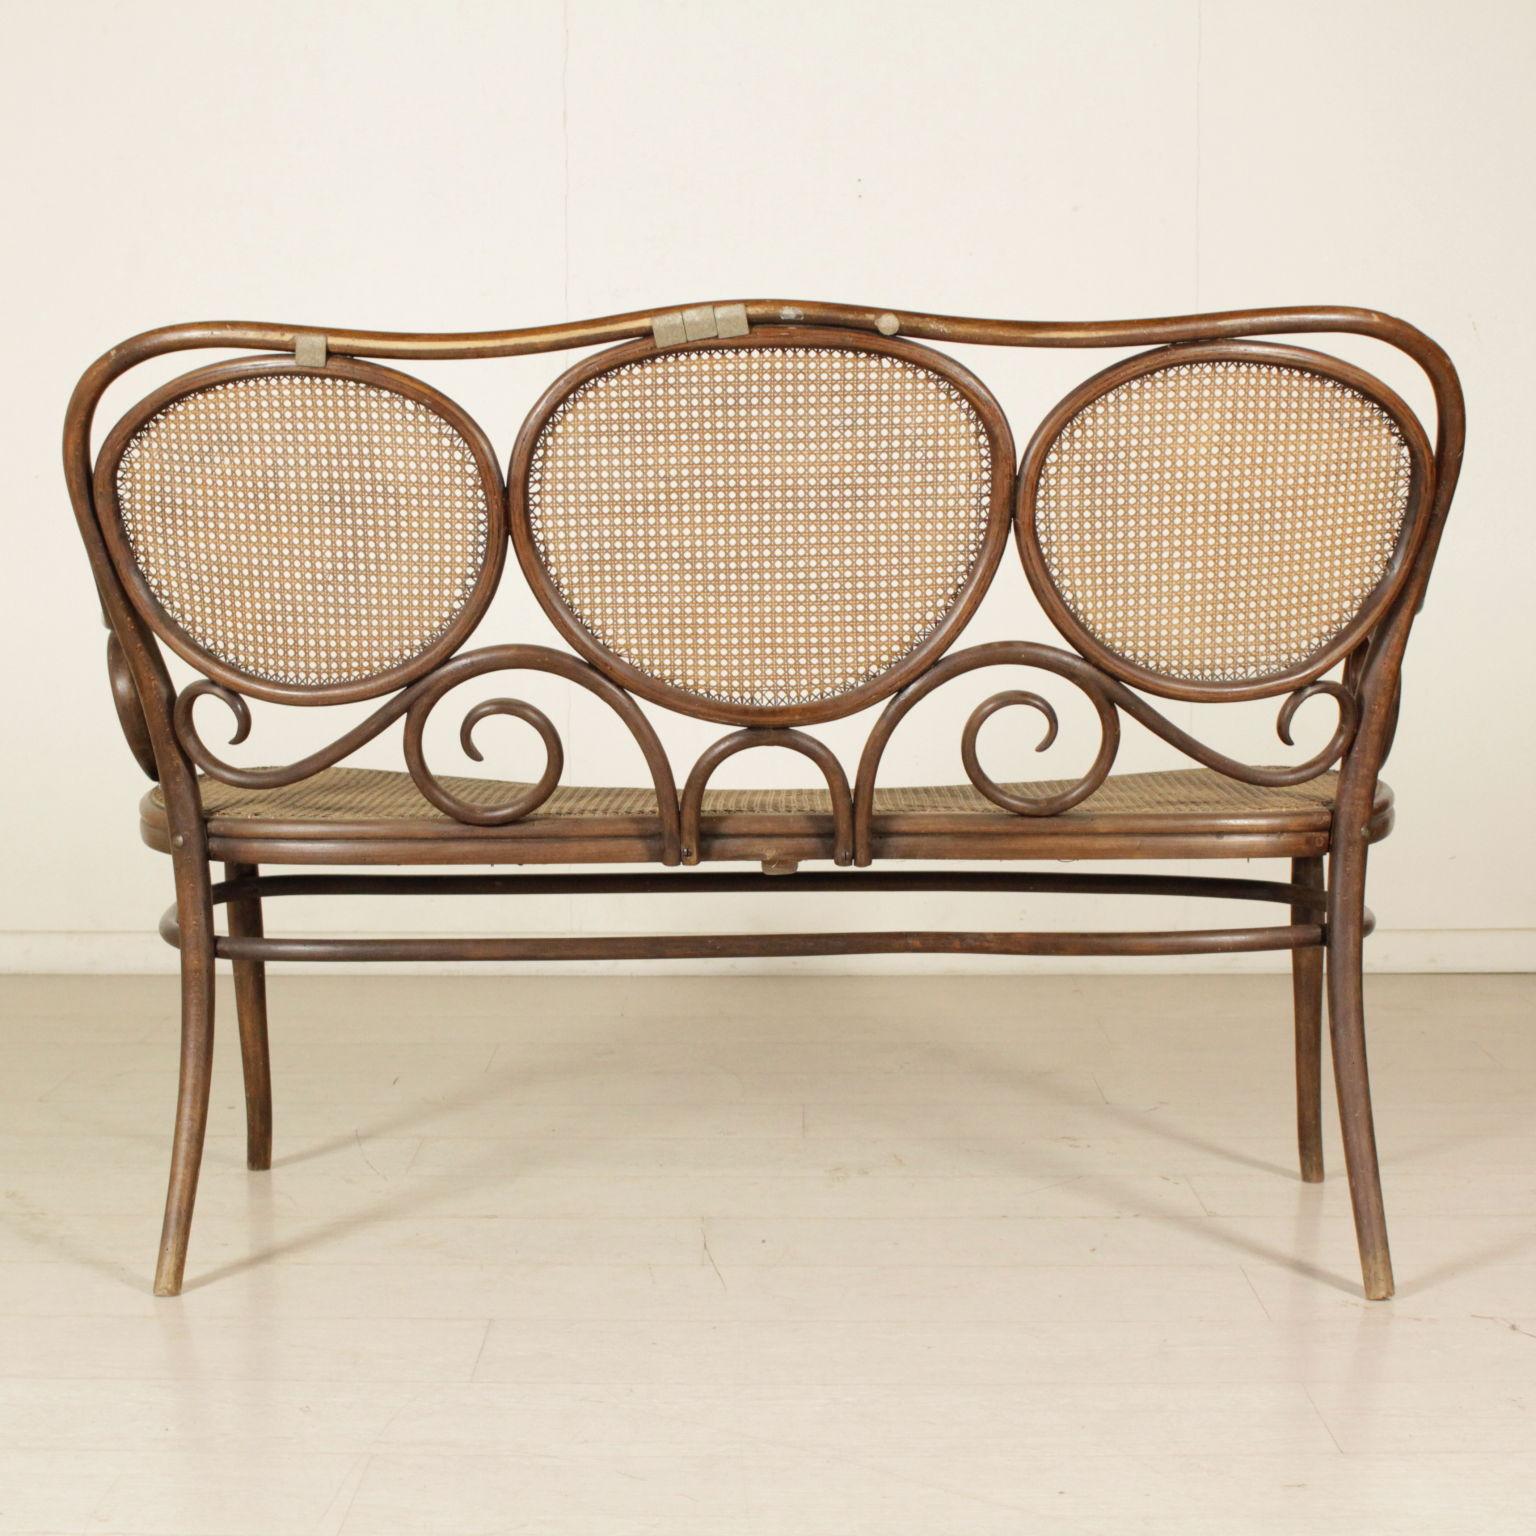 divano thonet mobili in stile bottega del 900